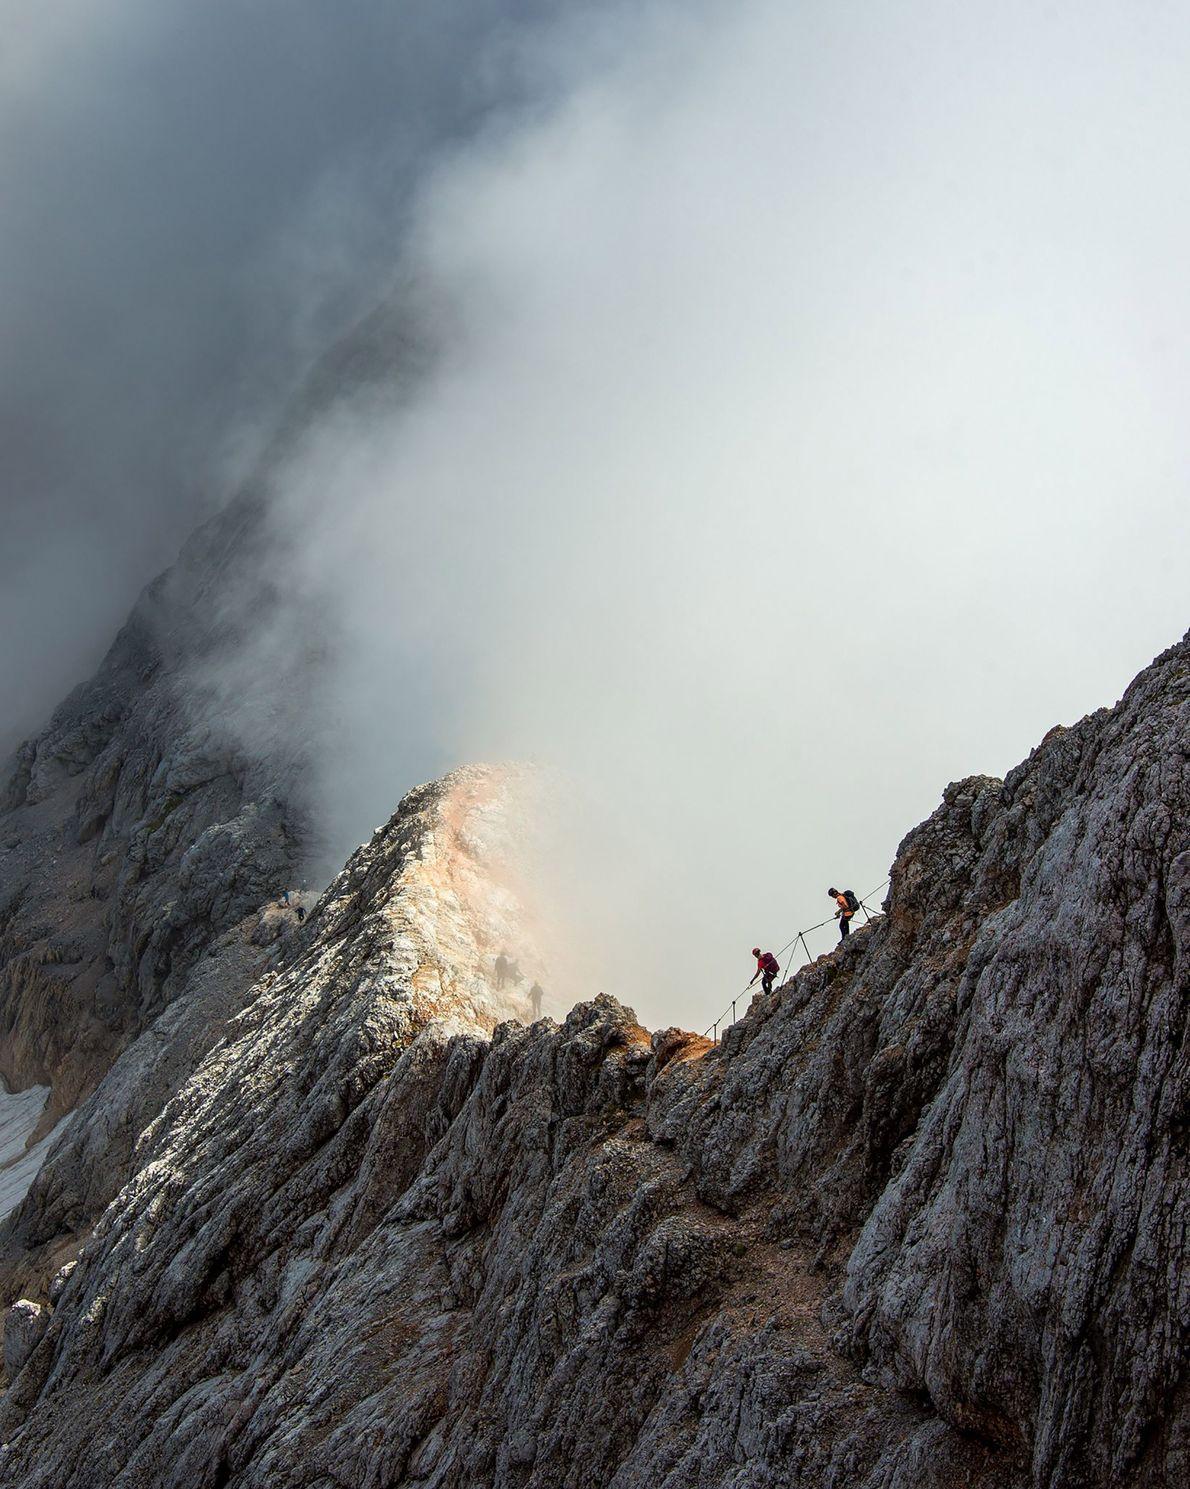 Mount Triglav, northwestern Slovenia